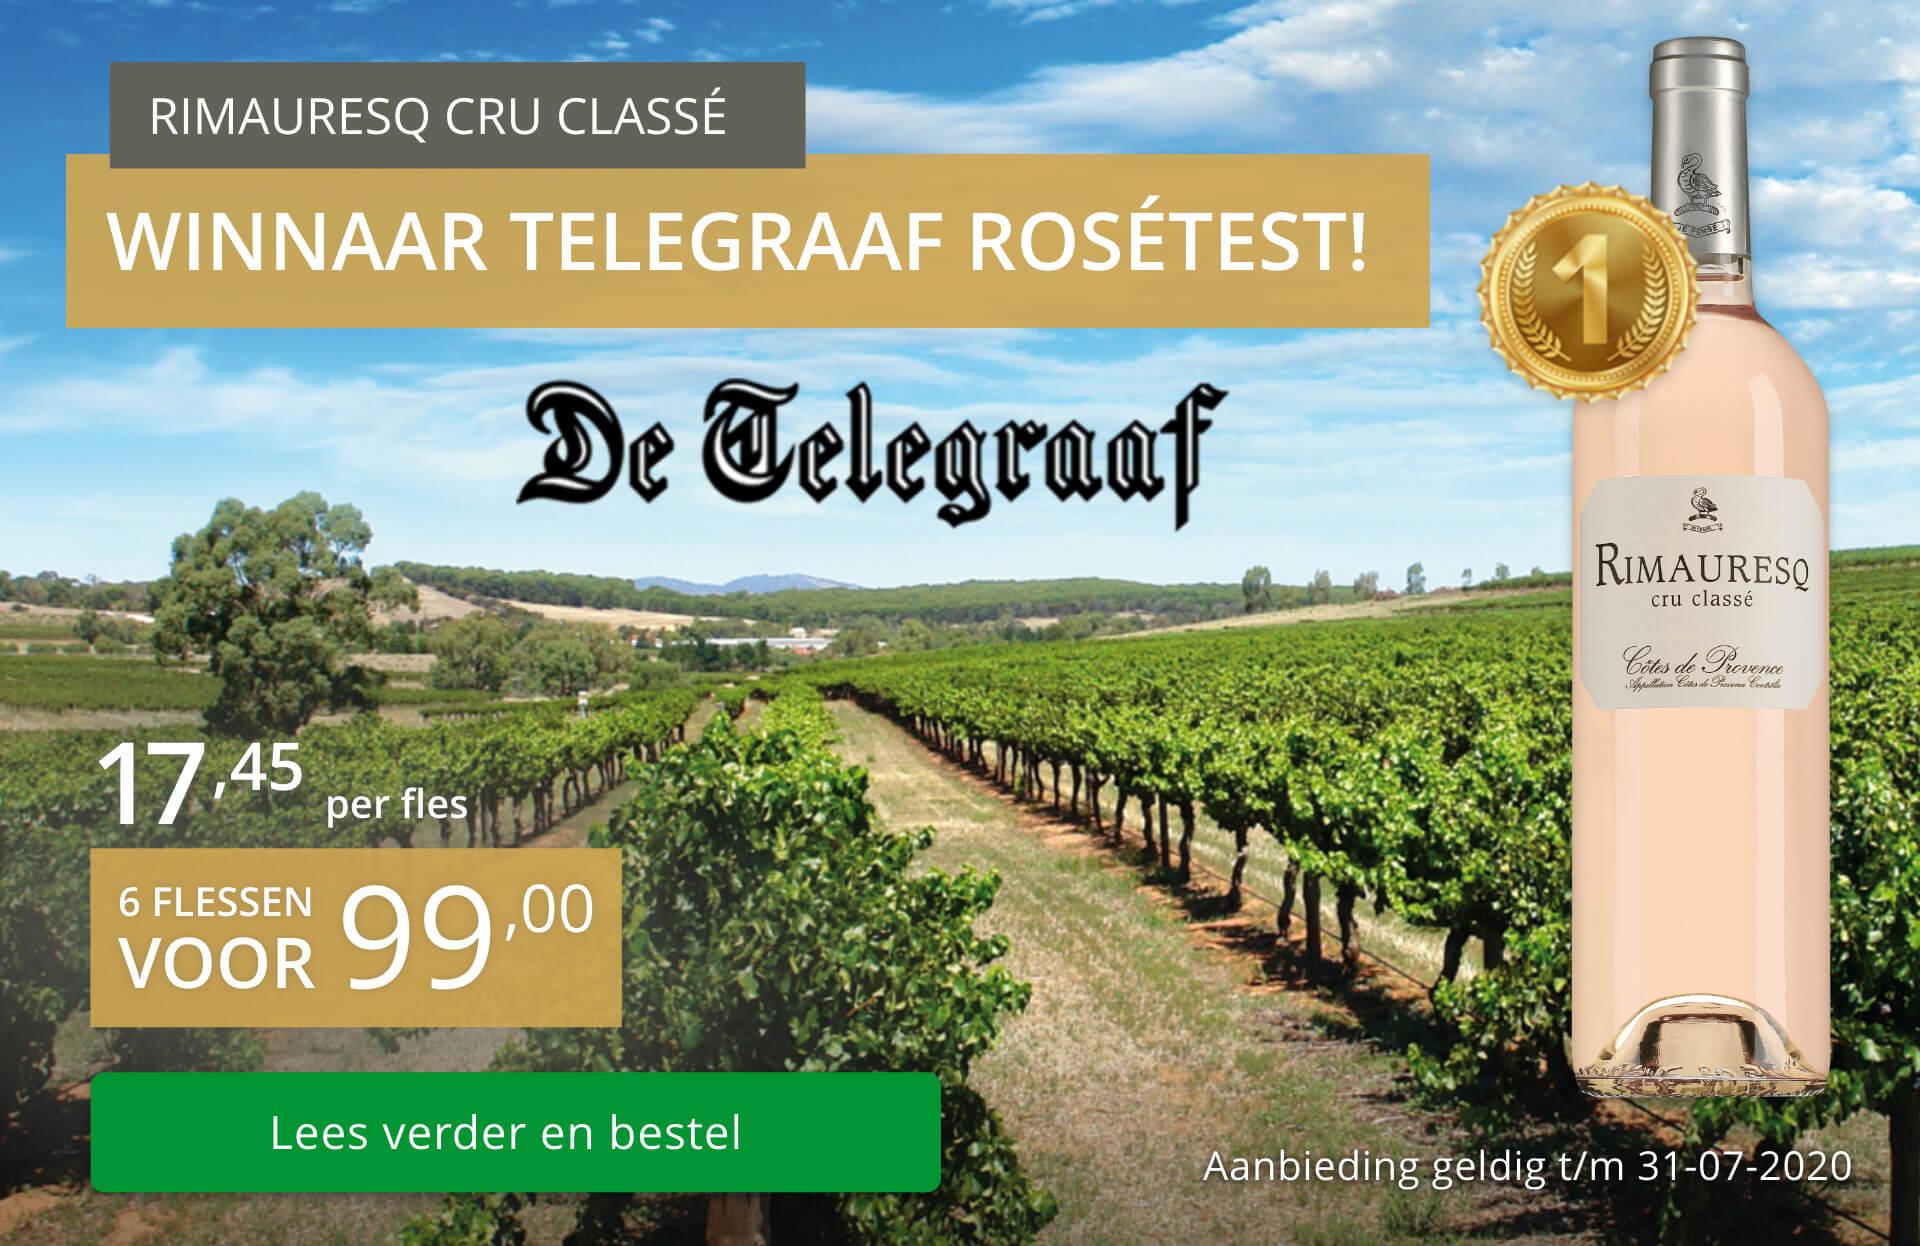 Rimauresq Cru Classé: winnaar Telegraaf rosétest